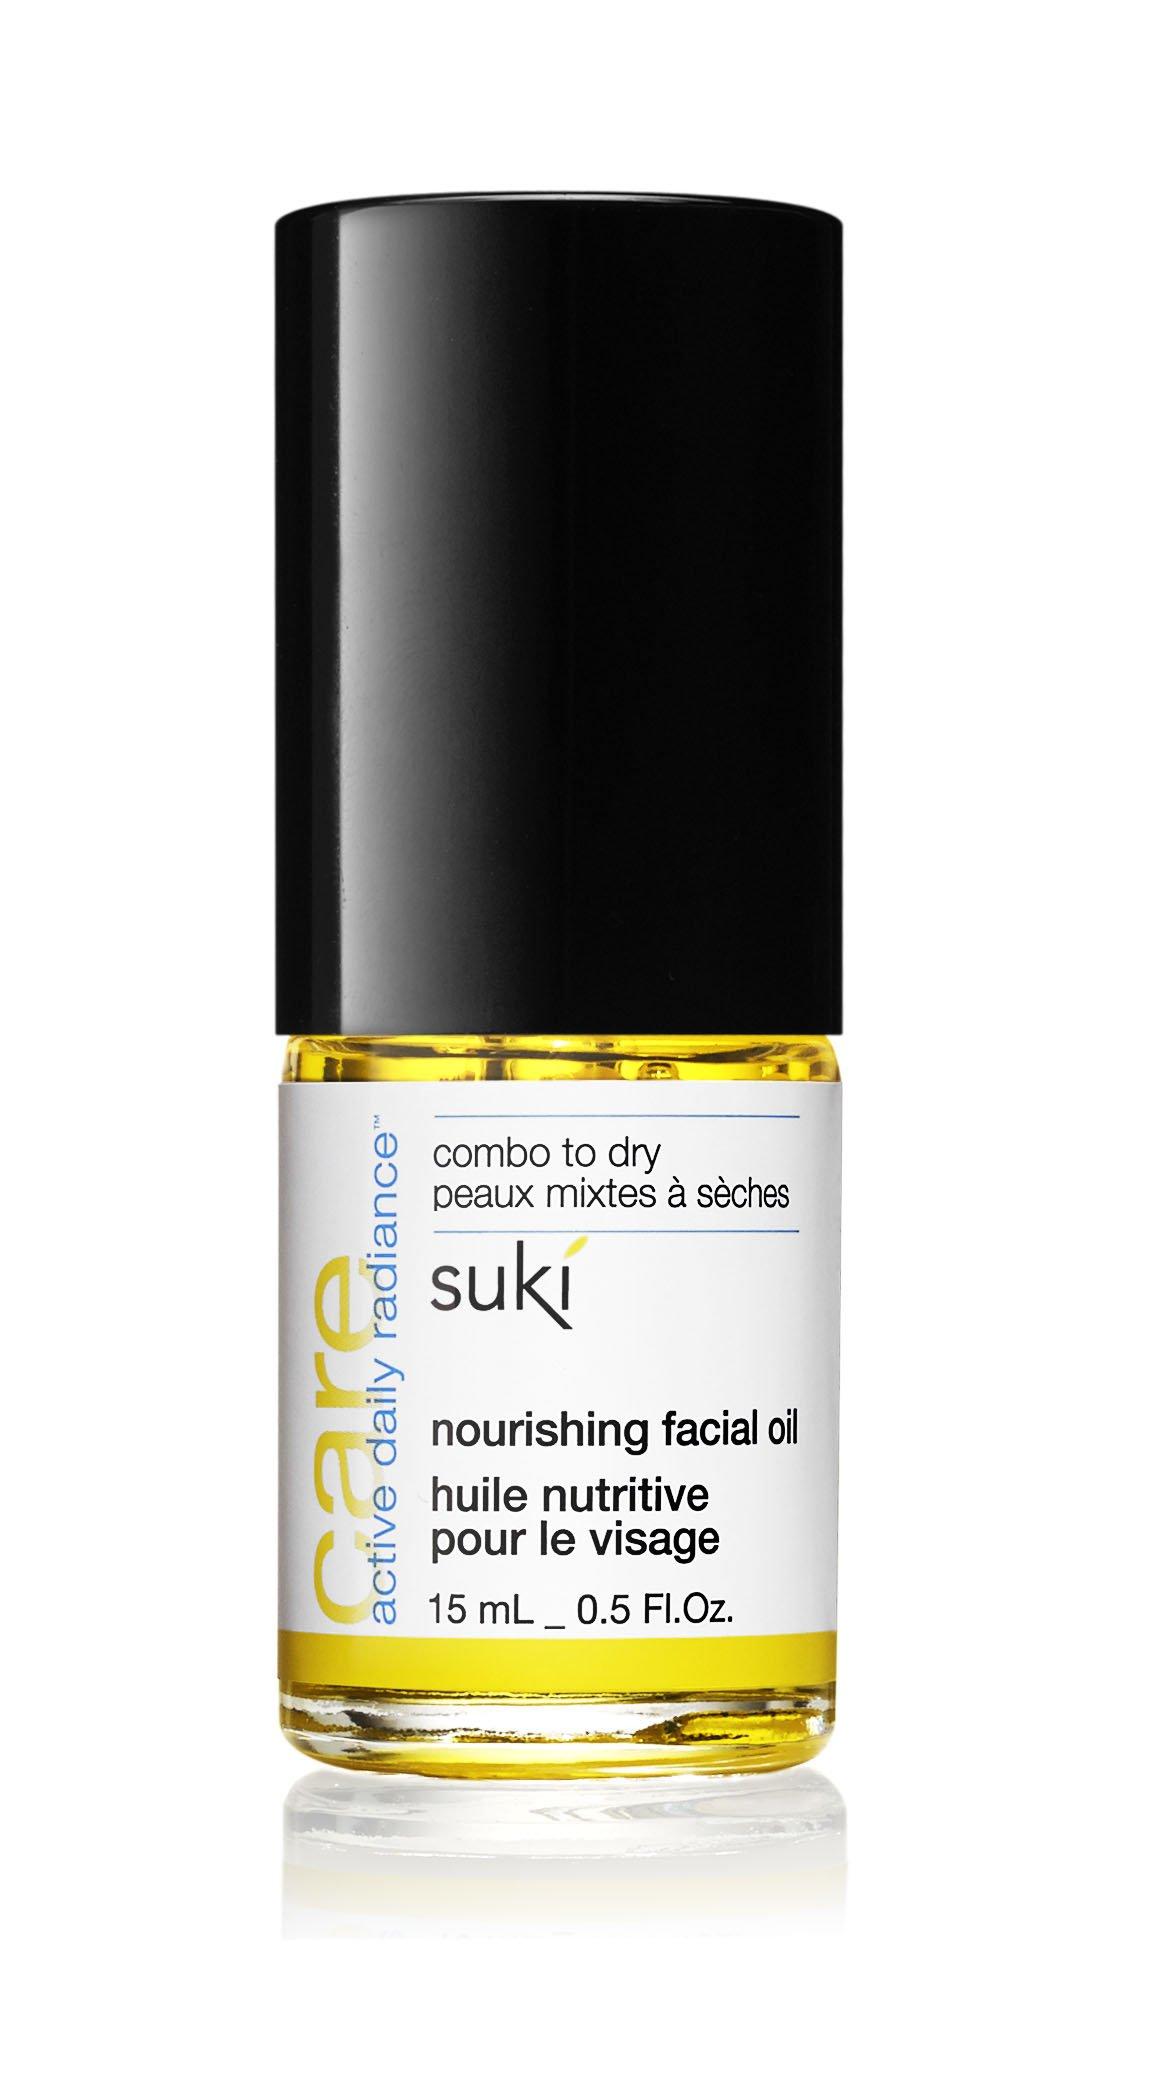 Suki Nourishing Facial Oil - 15 ml